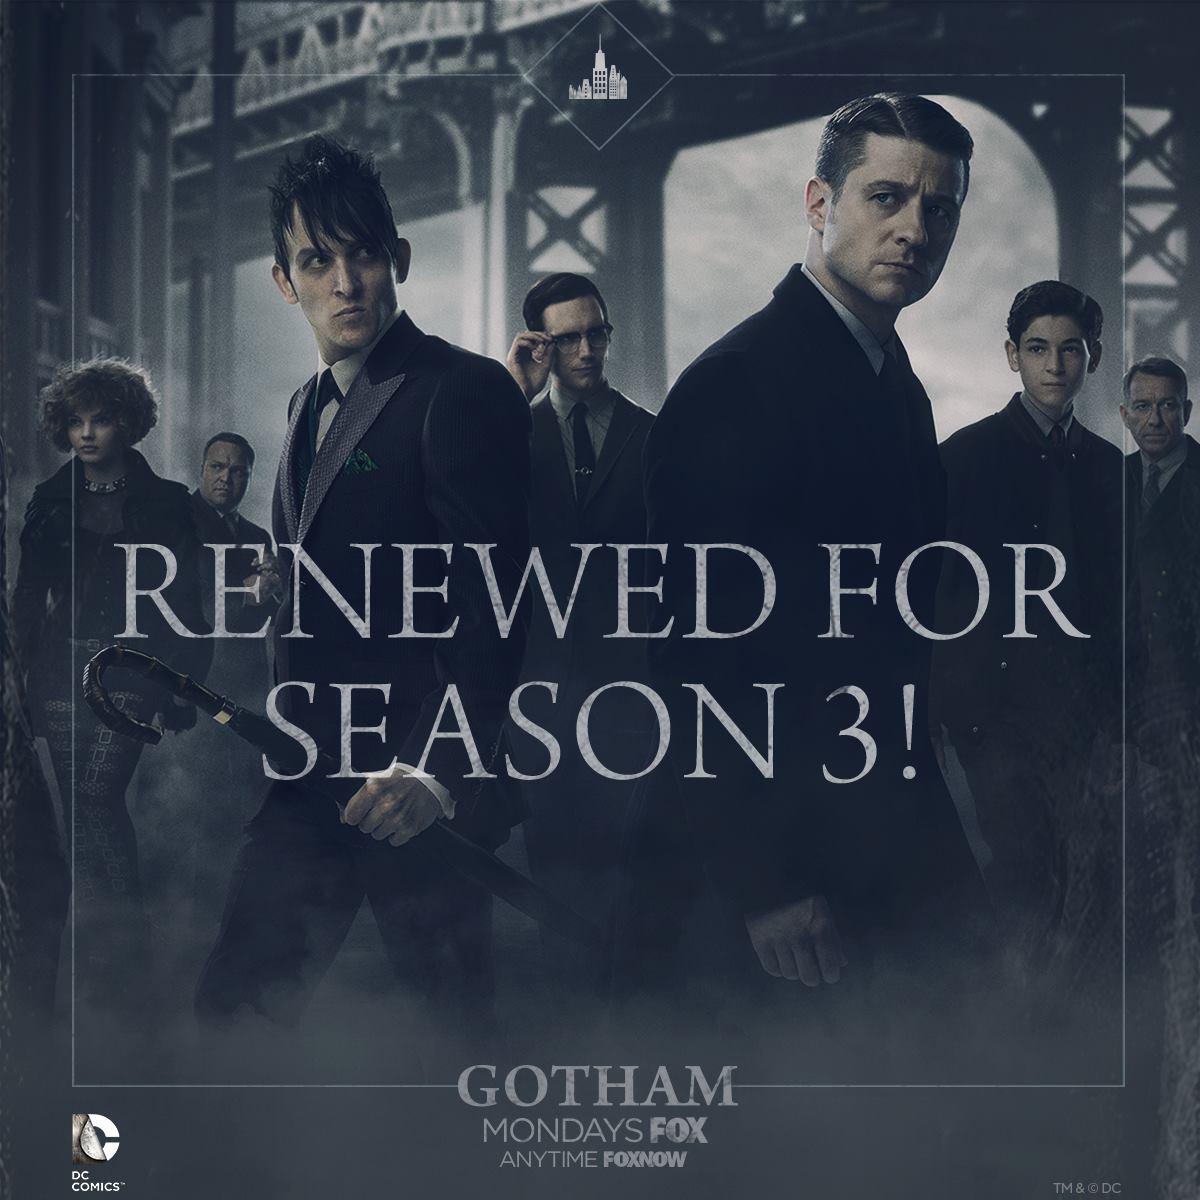 Gotham renewed for Season 3